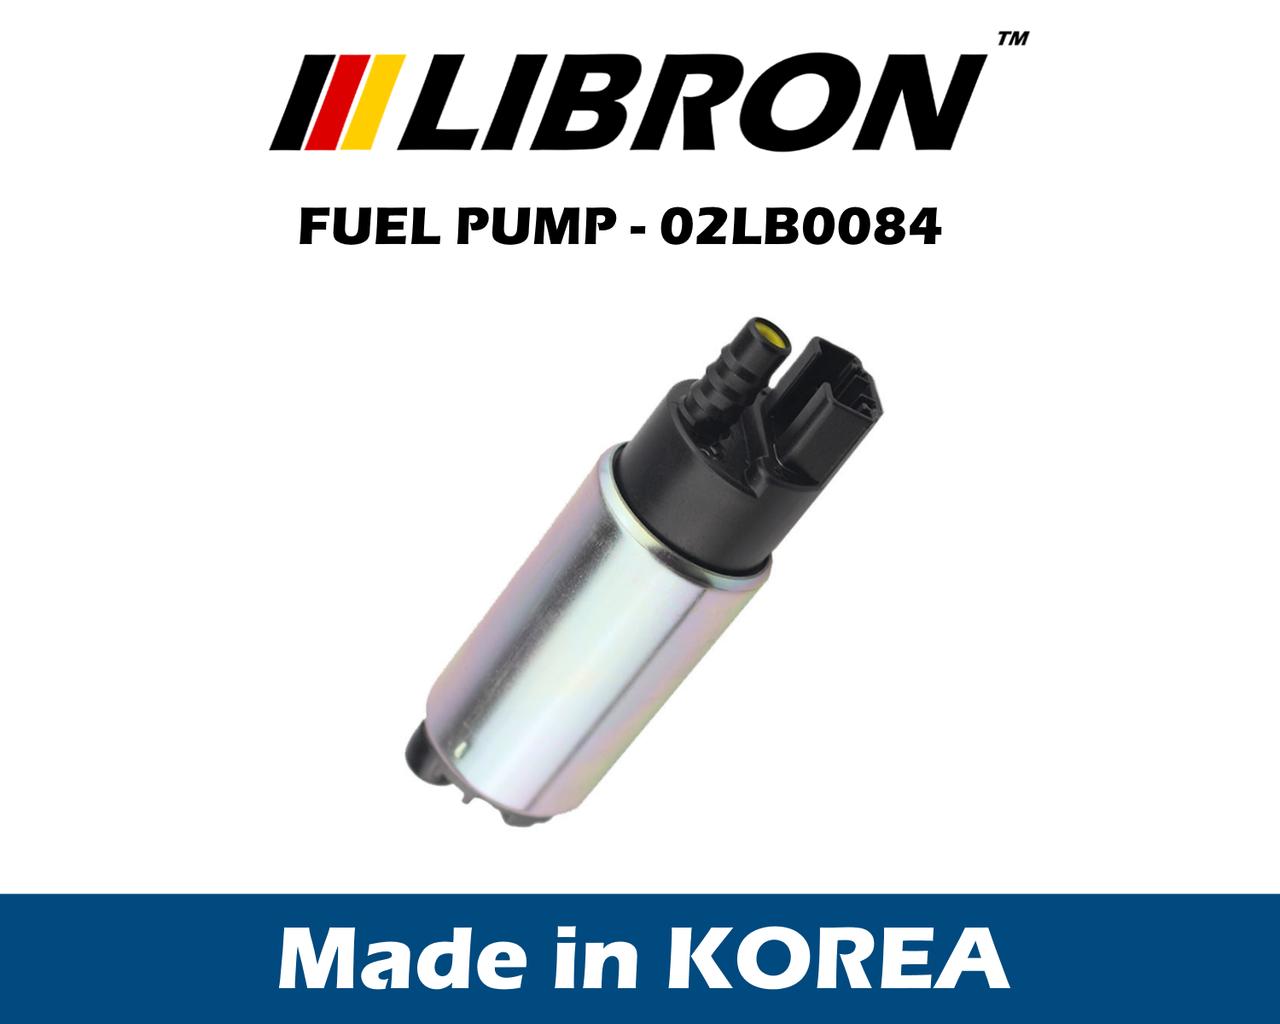 Бензонасос LIBRON 02LB0084 - KIA SHUMA седан